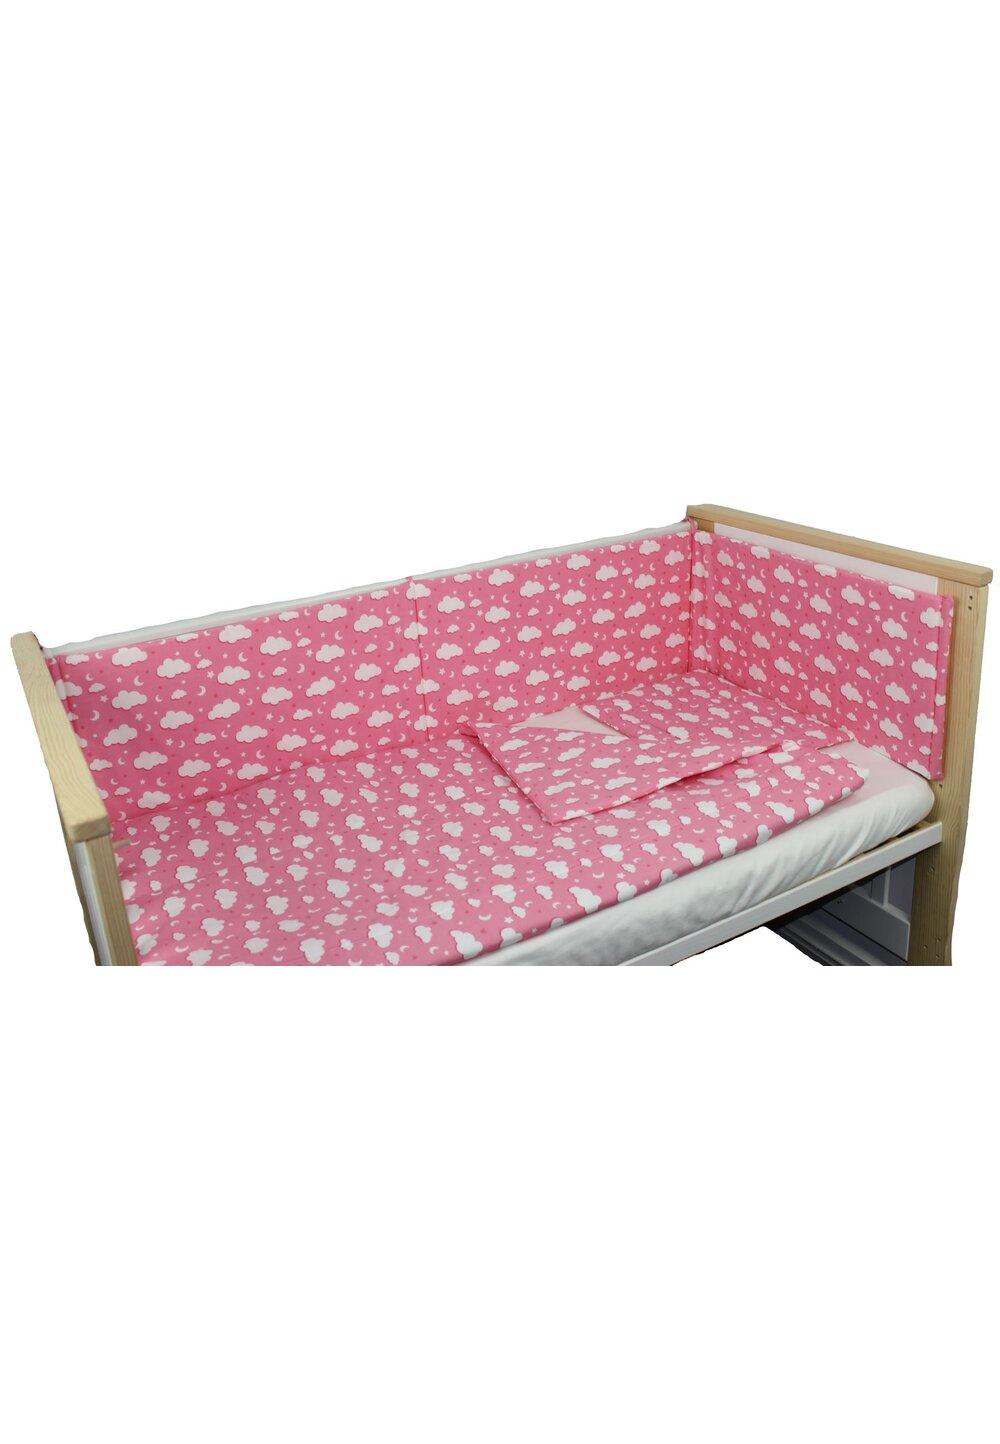 Lenjerie 4 piese, norisori si stelute, roz, 120x60cm imagine